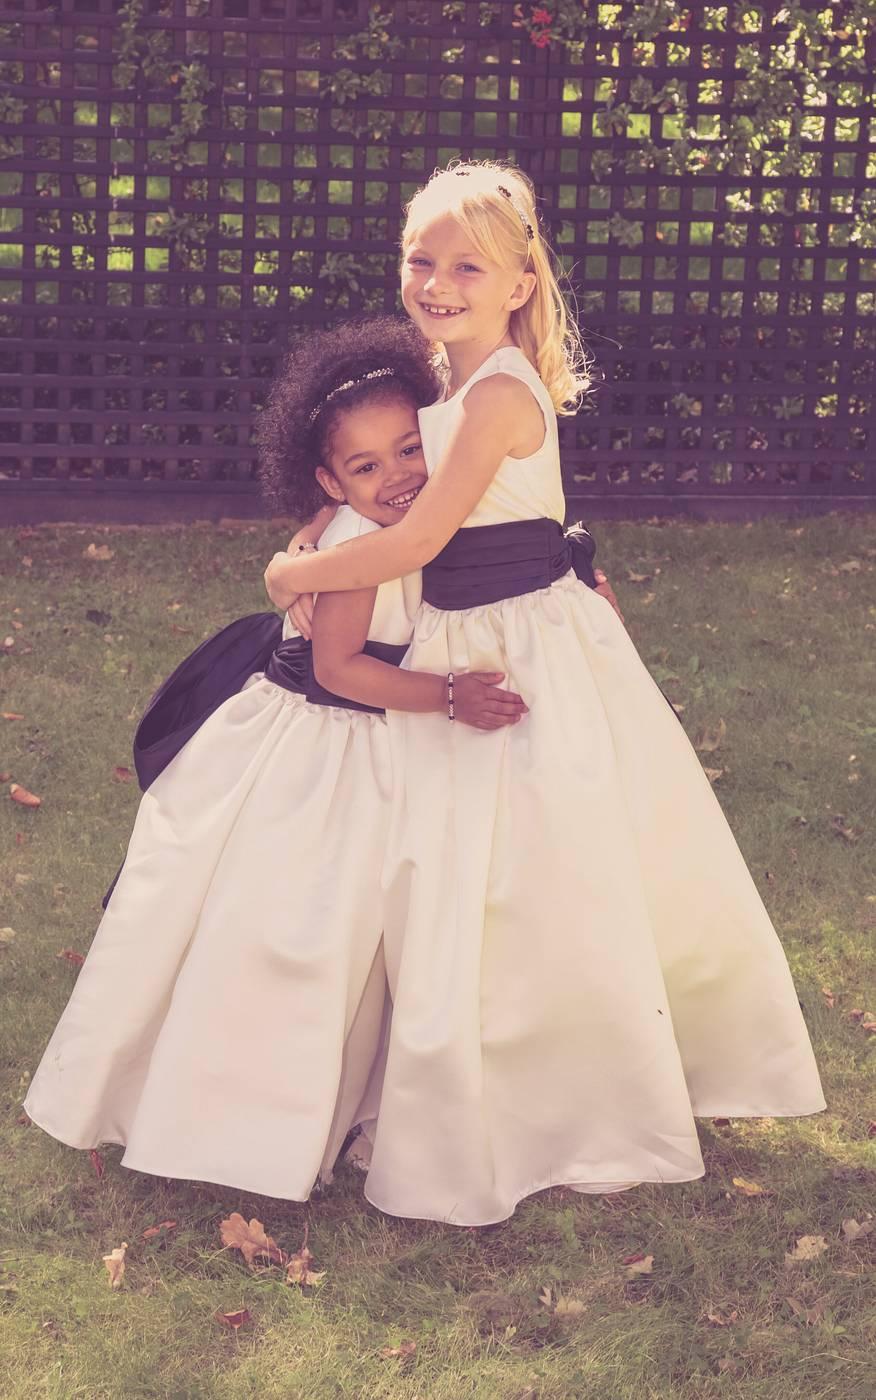 church-wedding-english-london-photographer-photography-fun-0001